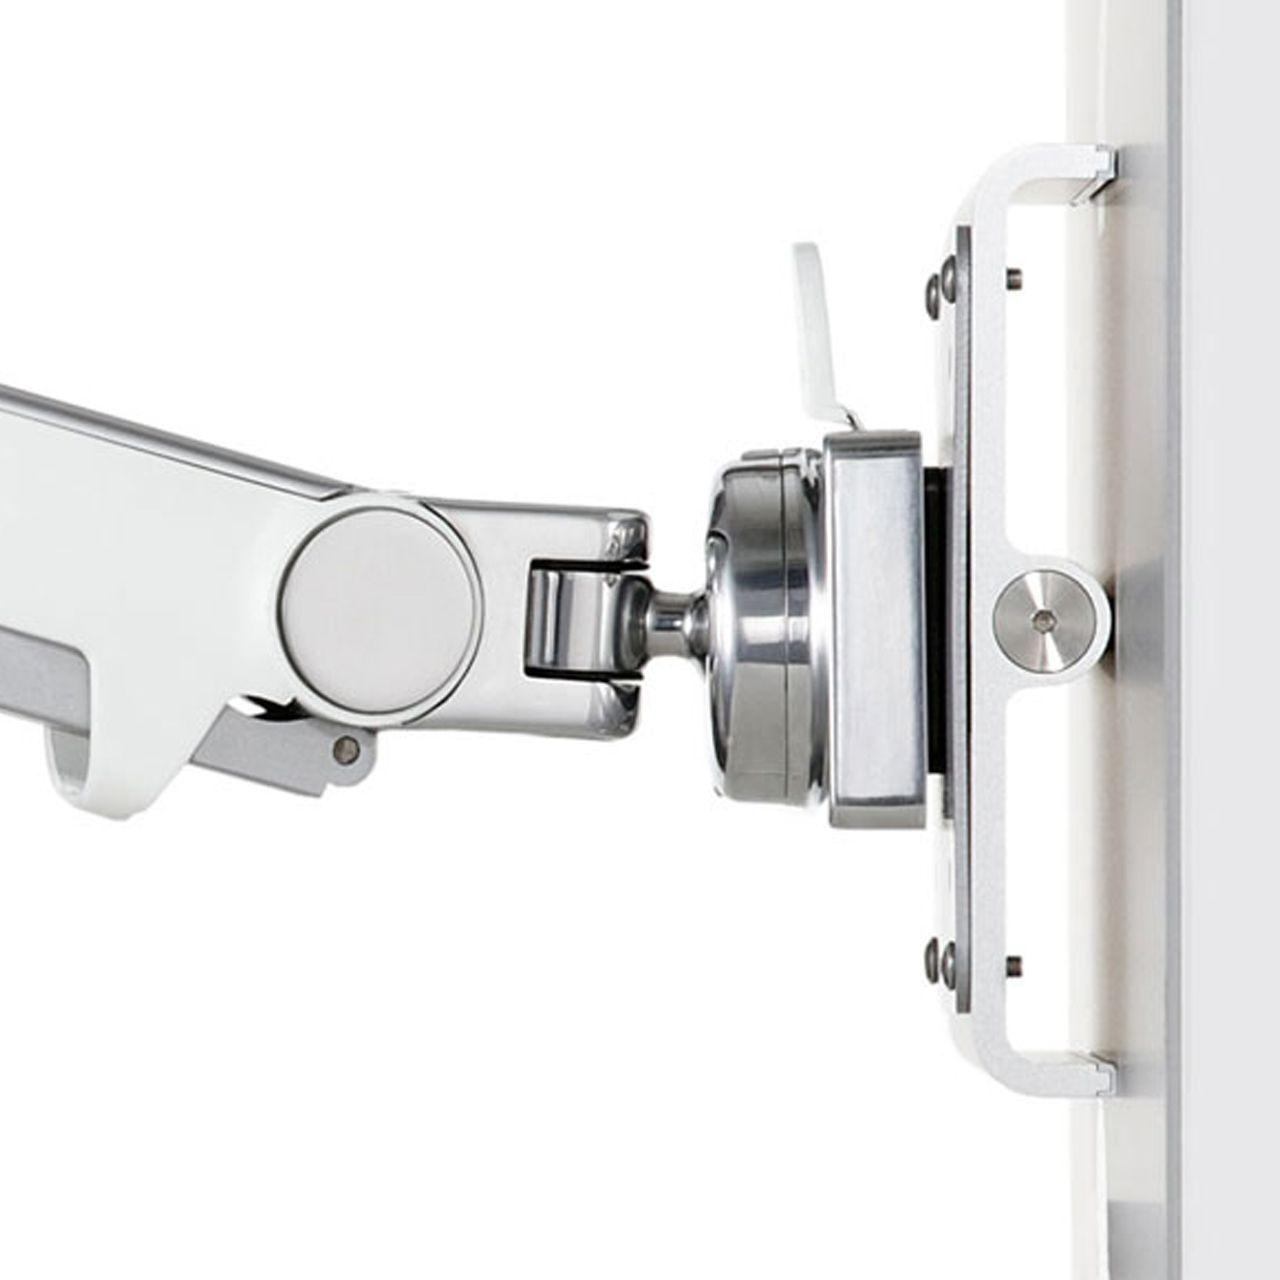 Humanscale M2 flatscreenarm Detail